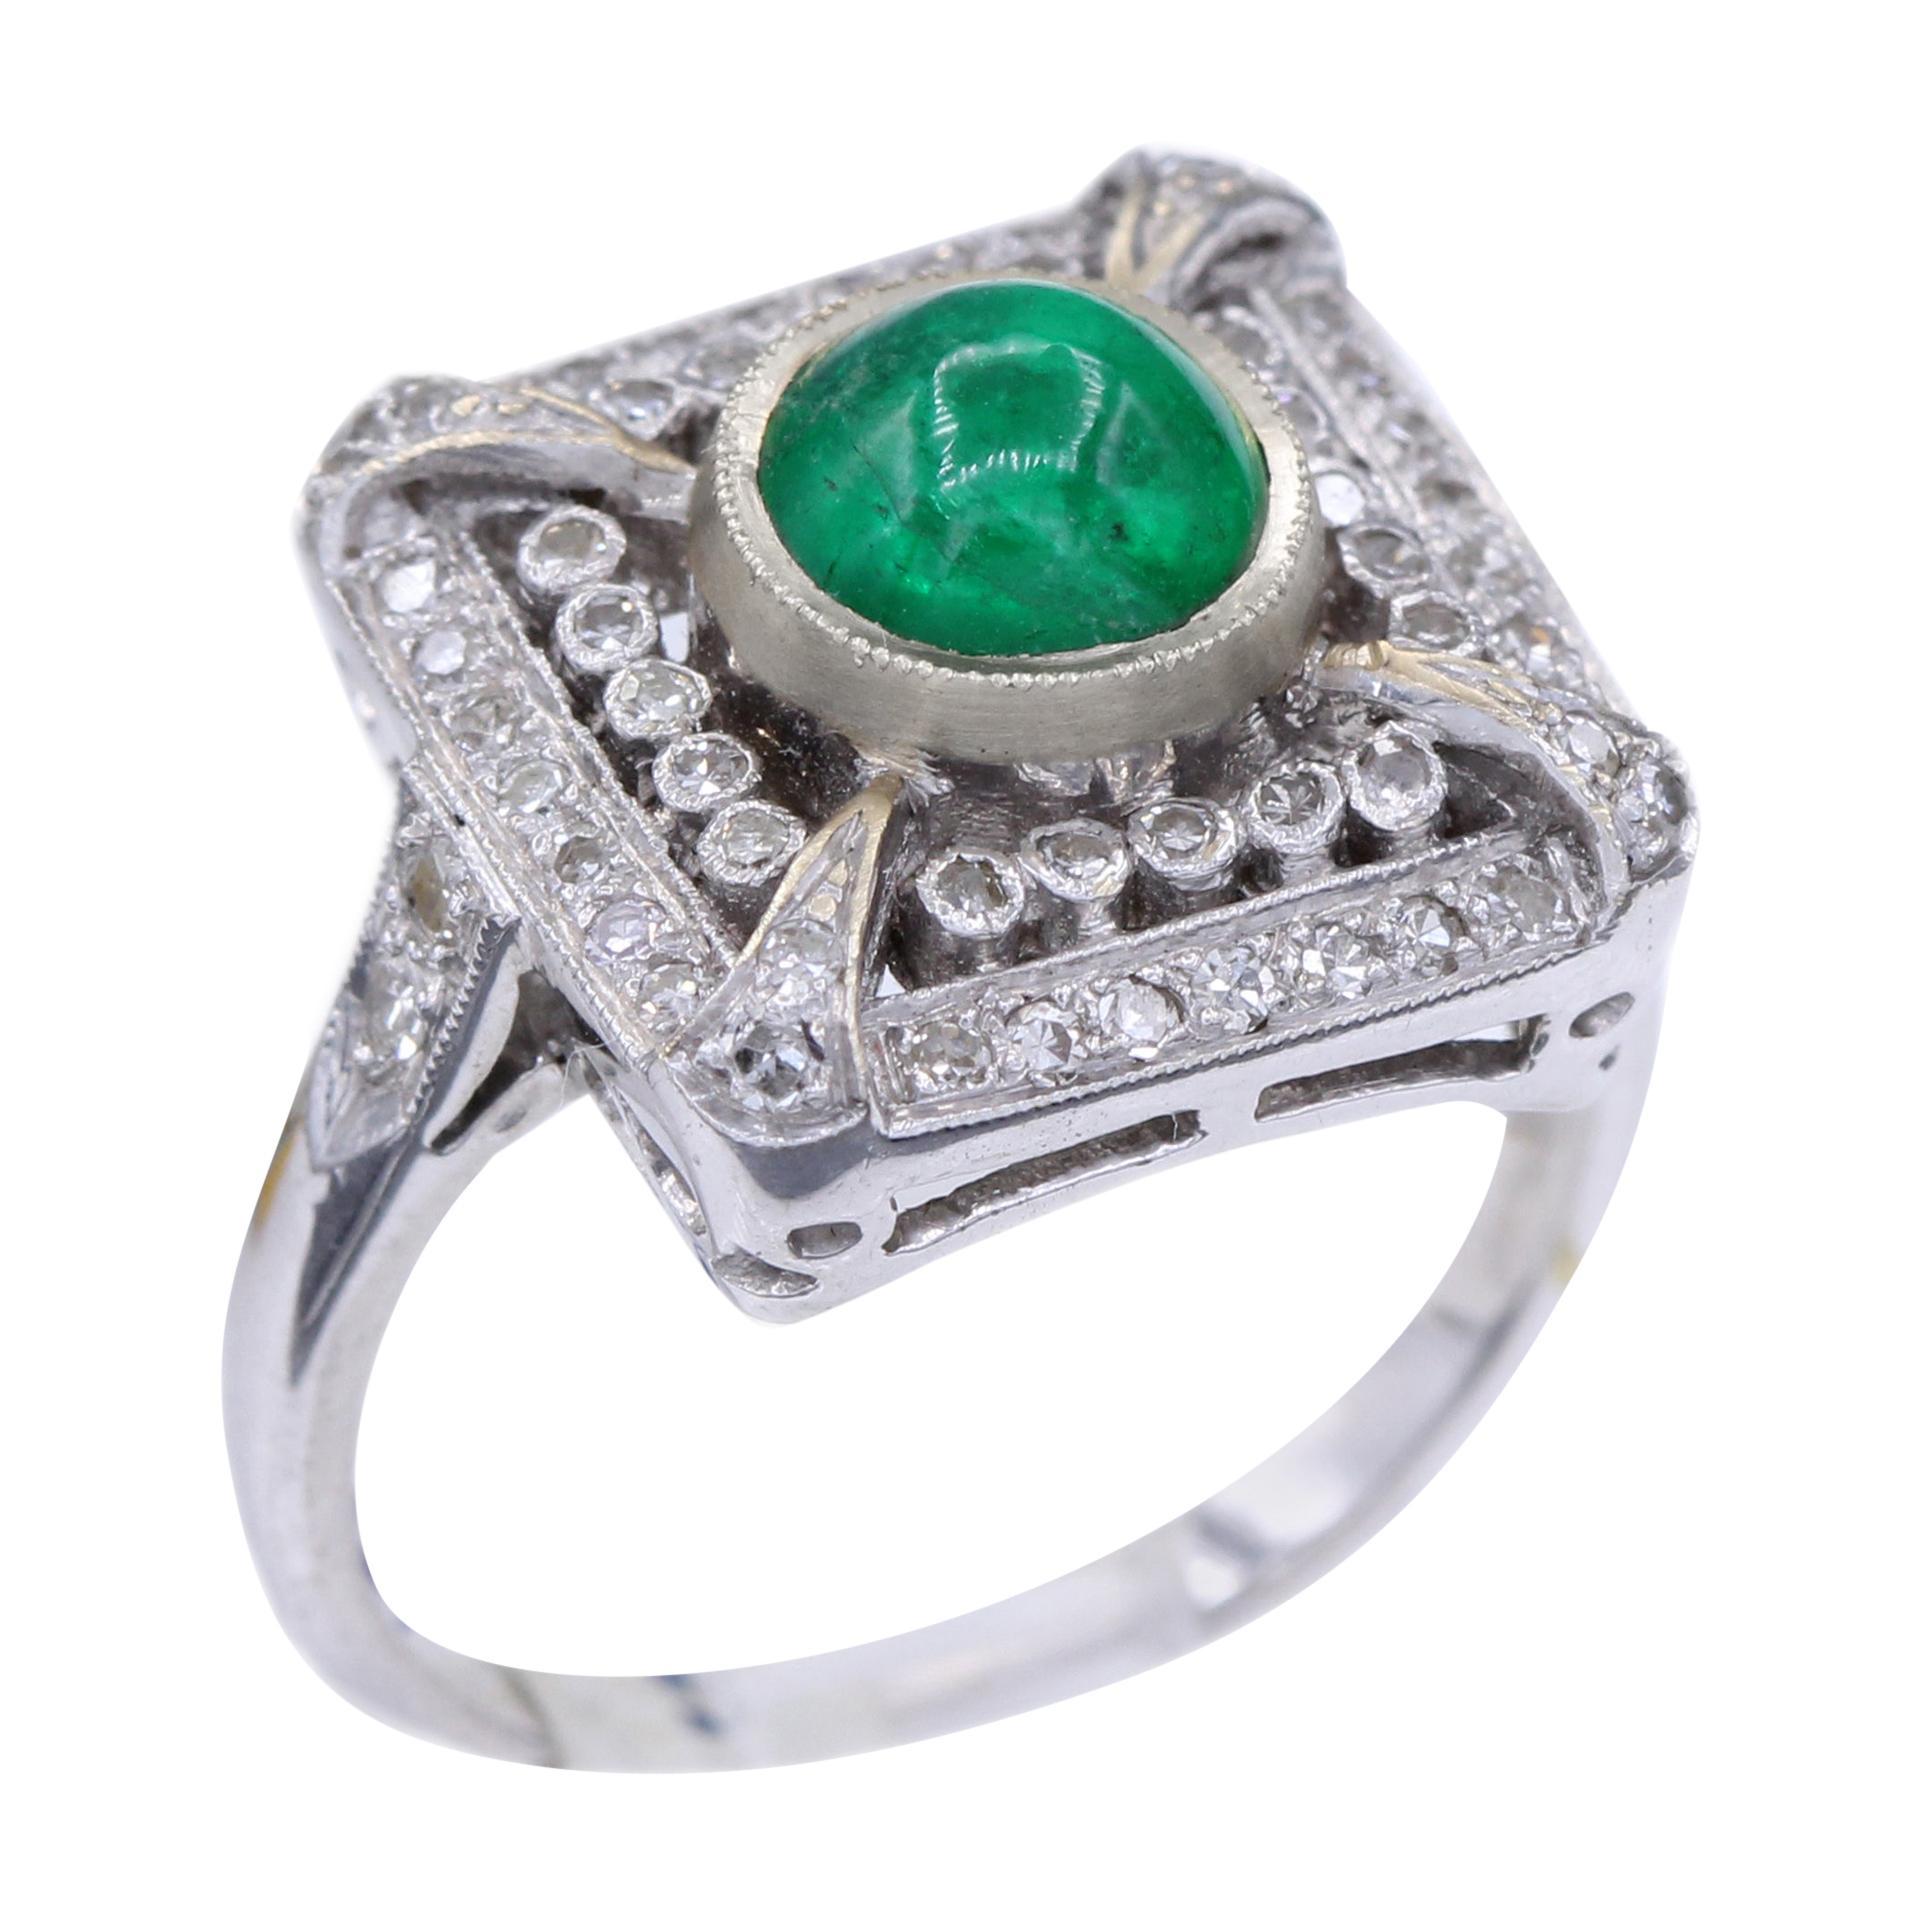 Vintage Emerald 18 Karat White Gold Ring with Diamonds Cabochon Emerald Ring